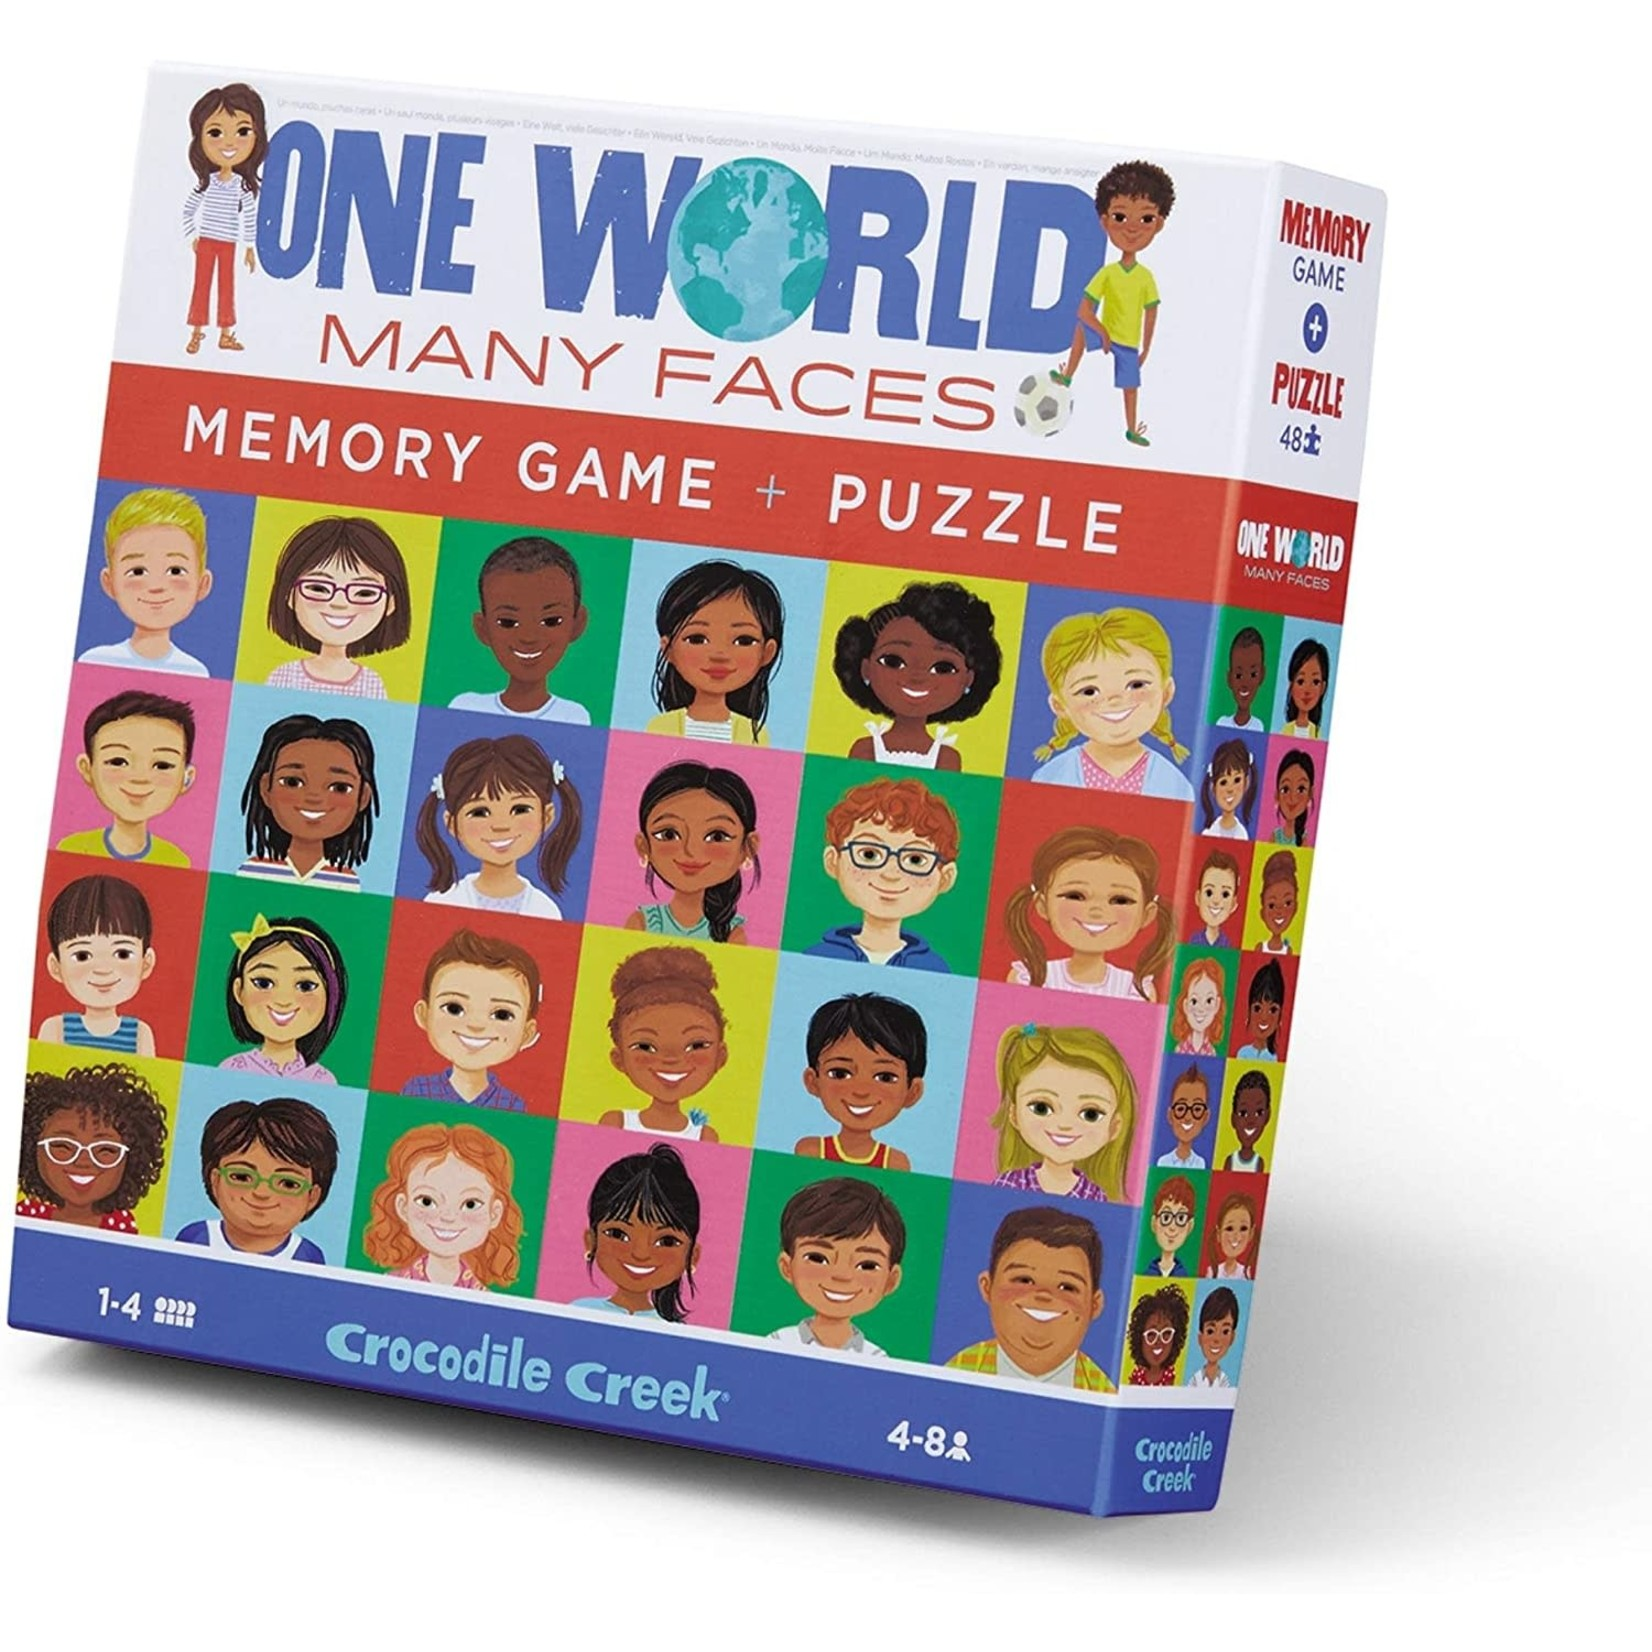 CROCODILE CREEK ONE WORLD, MANY FACES MEMORY GAME